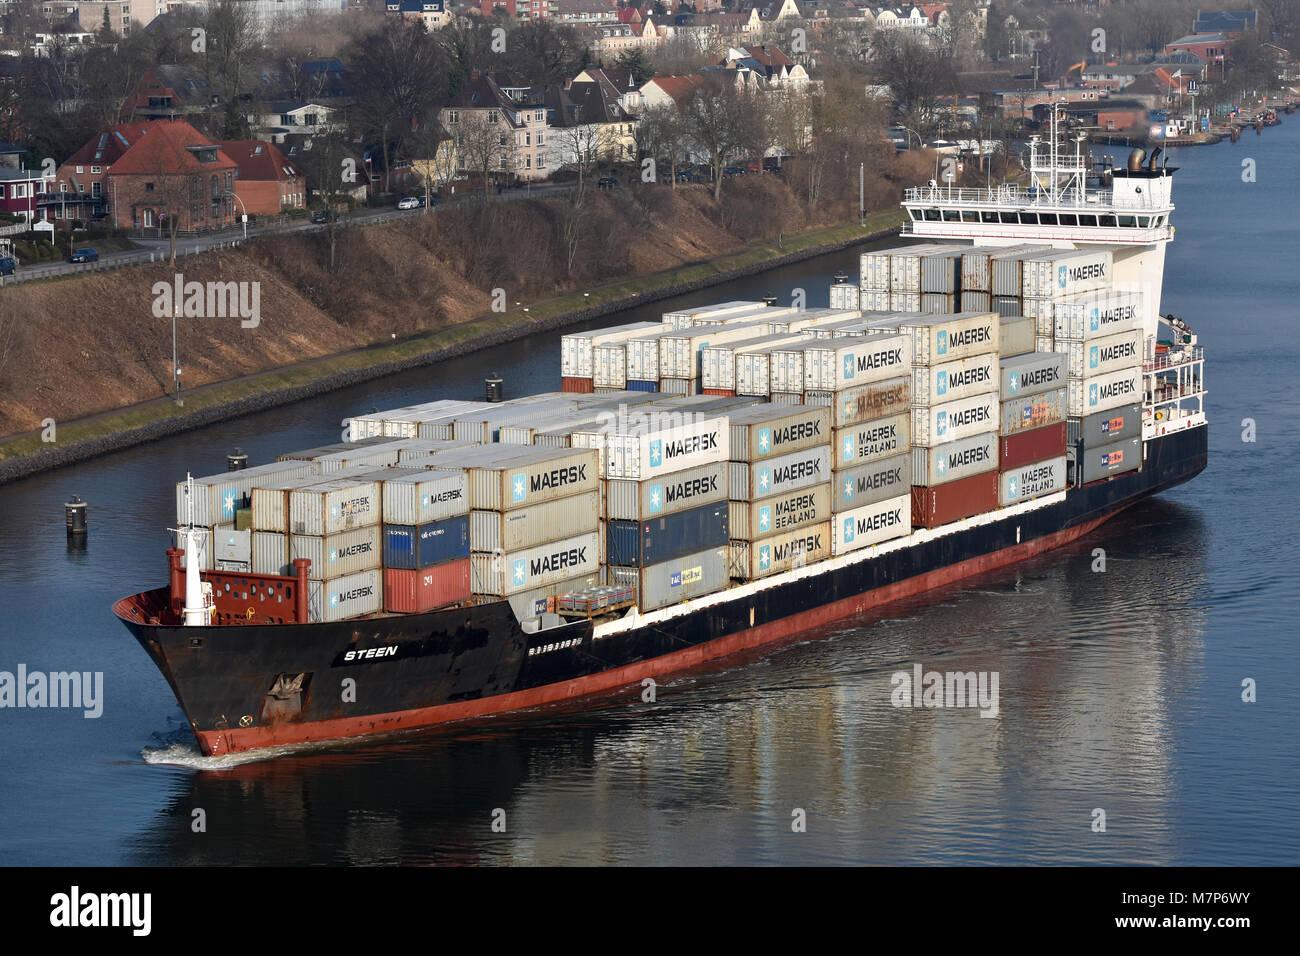 Feedervessel Steen westbound in the Kiel Canal off Kiel Holtenau - Stock Image